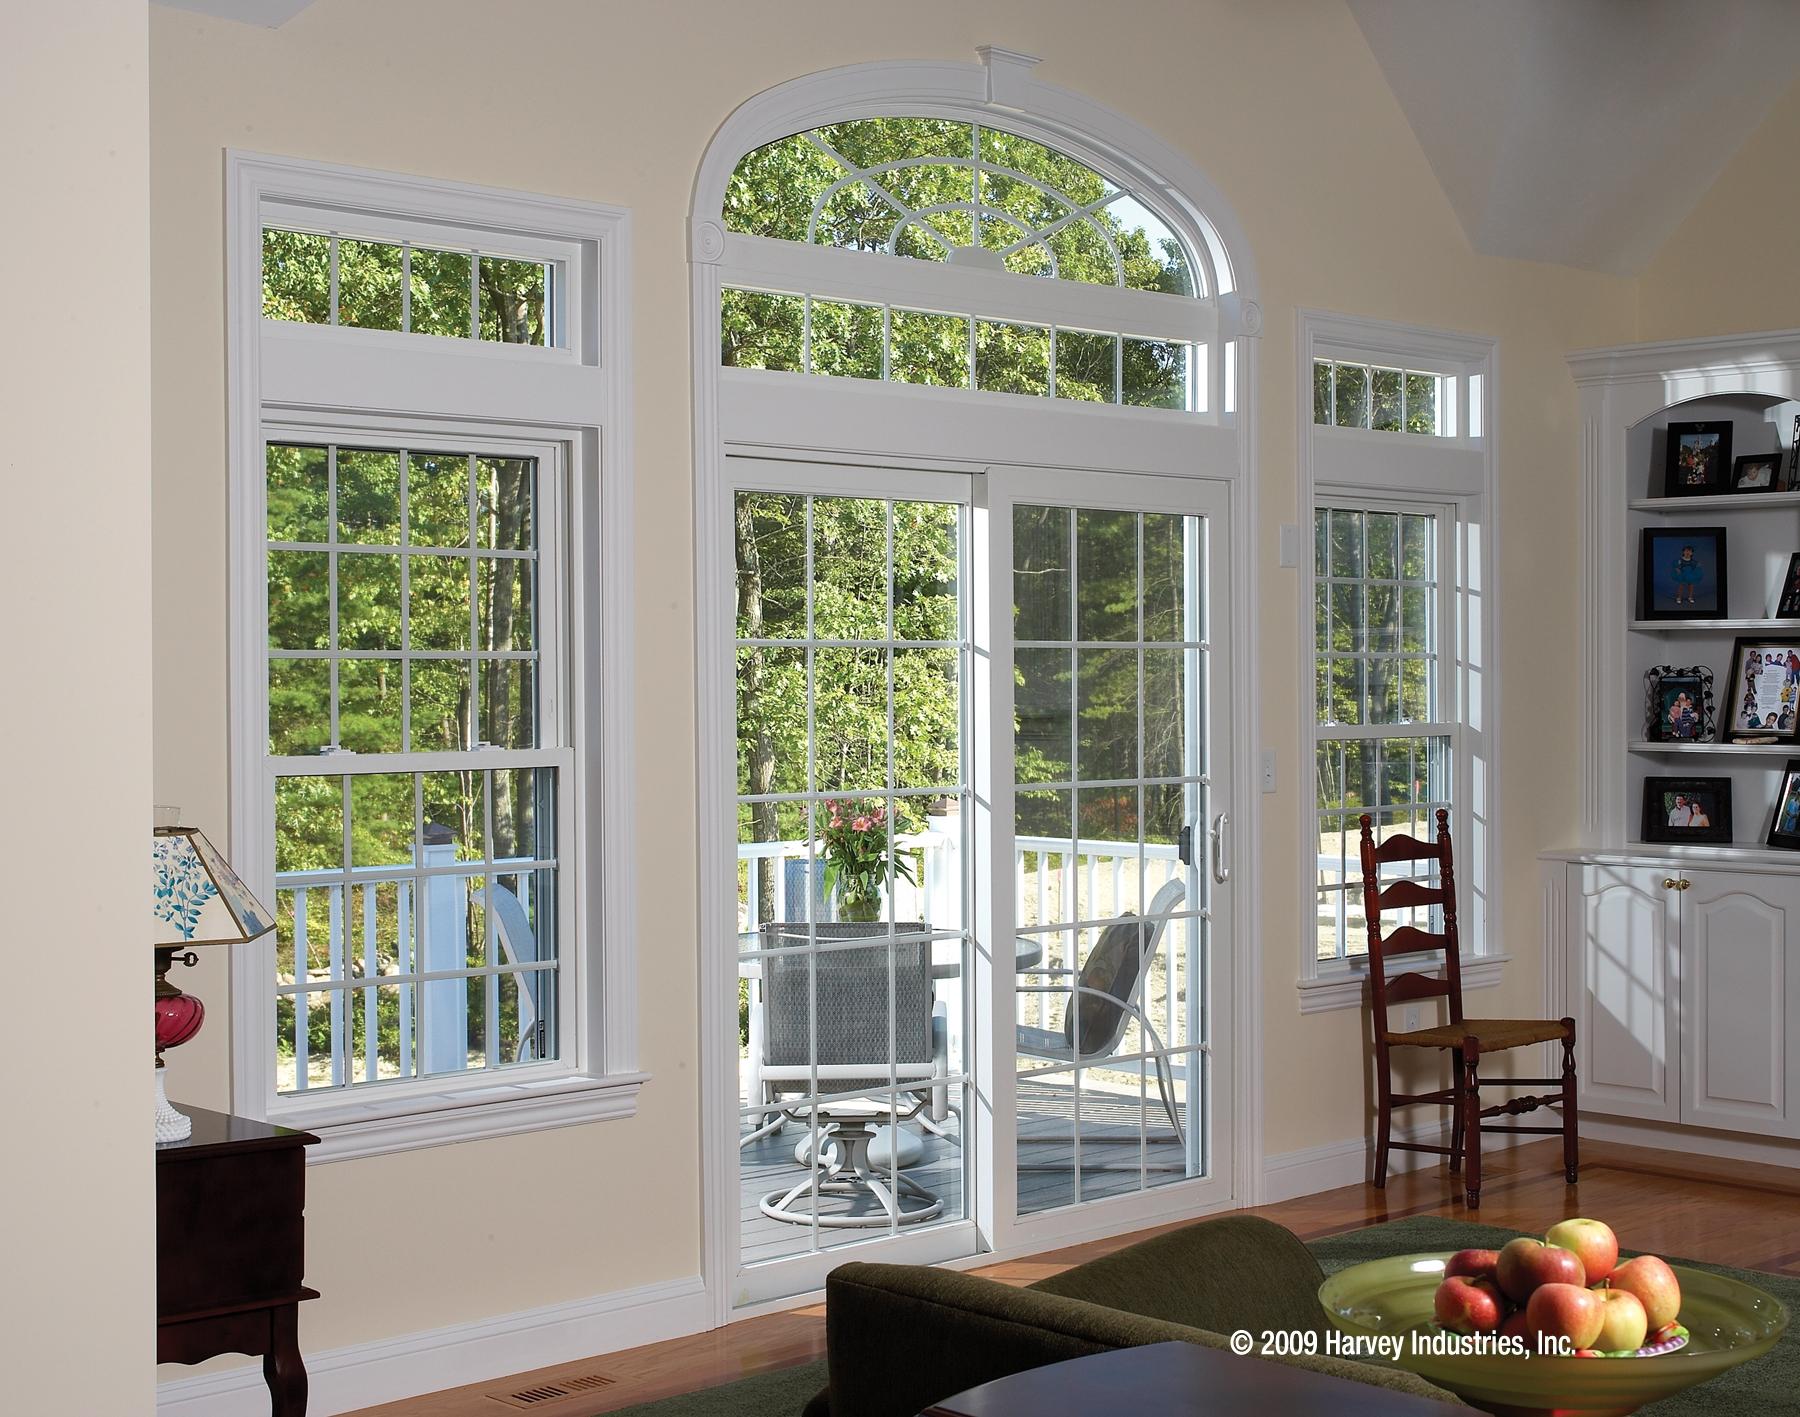 Types Of Sliding Patio Doorsdoor types windows solutions plus